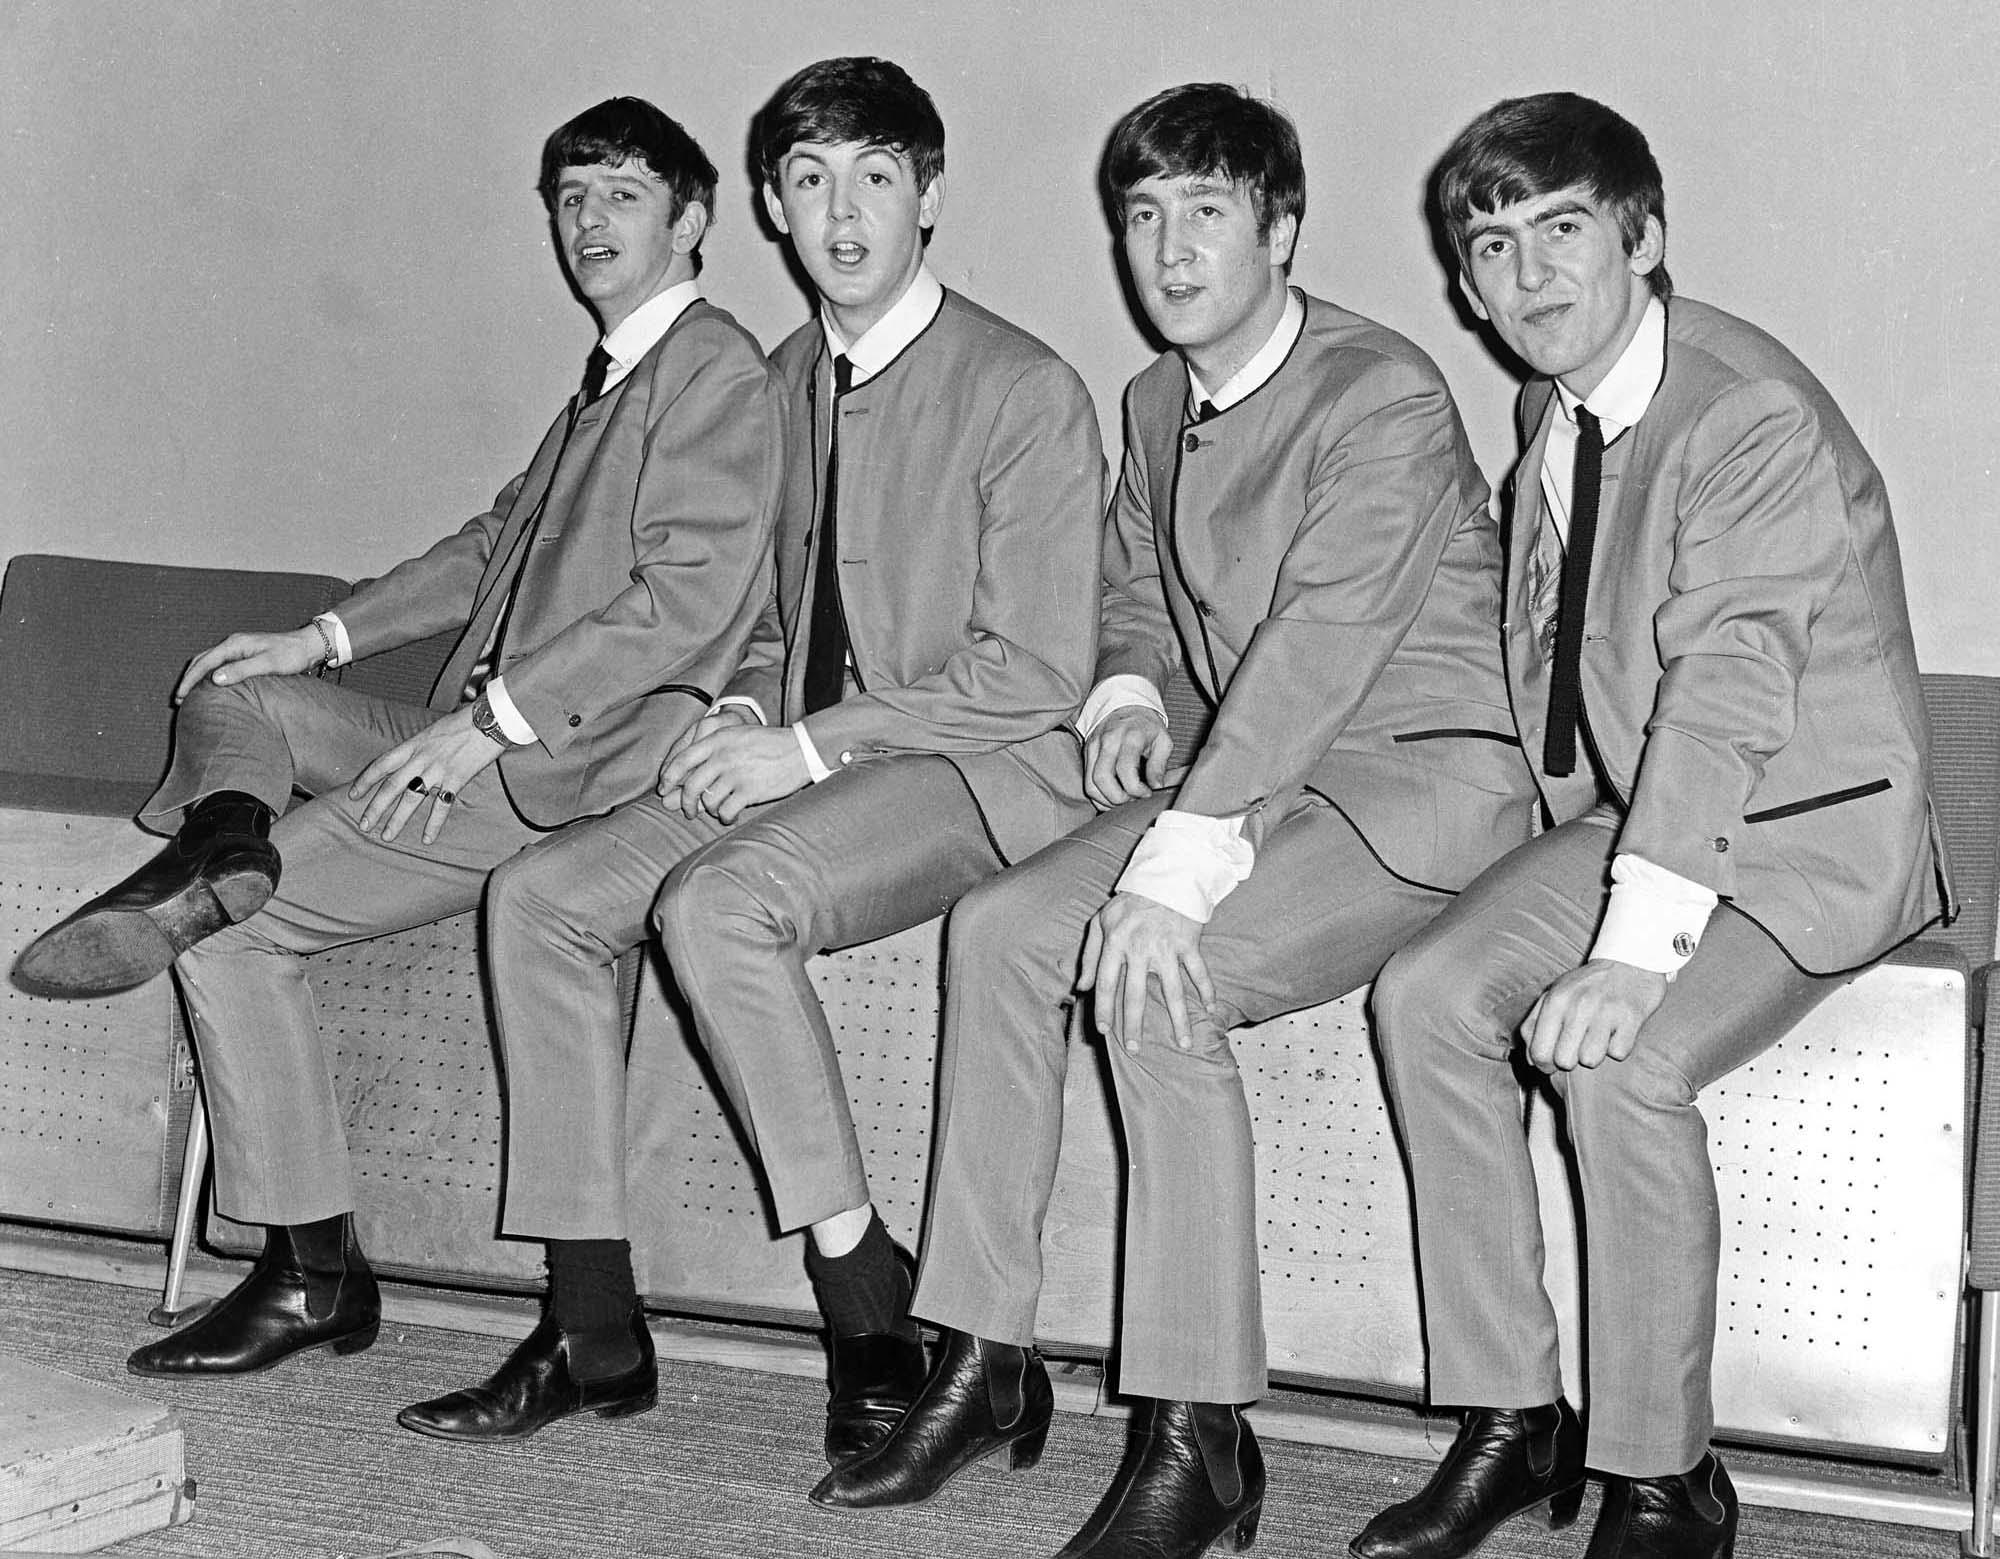 Beatles #1